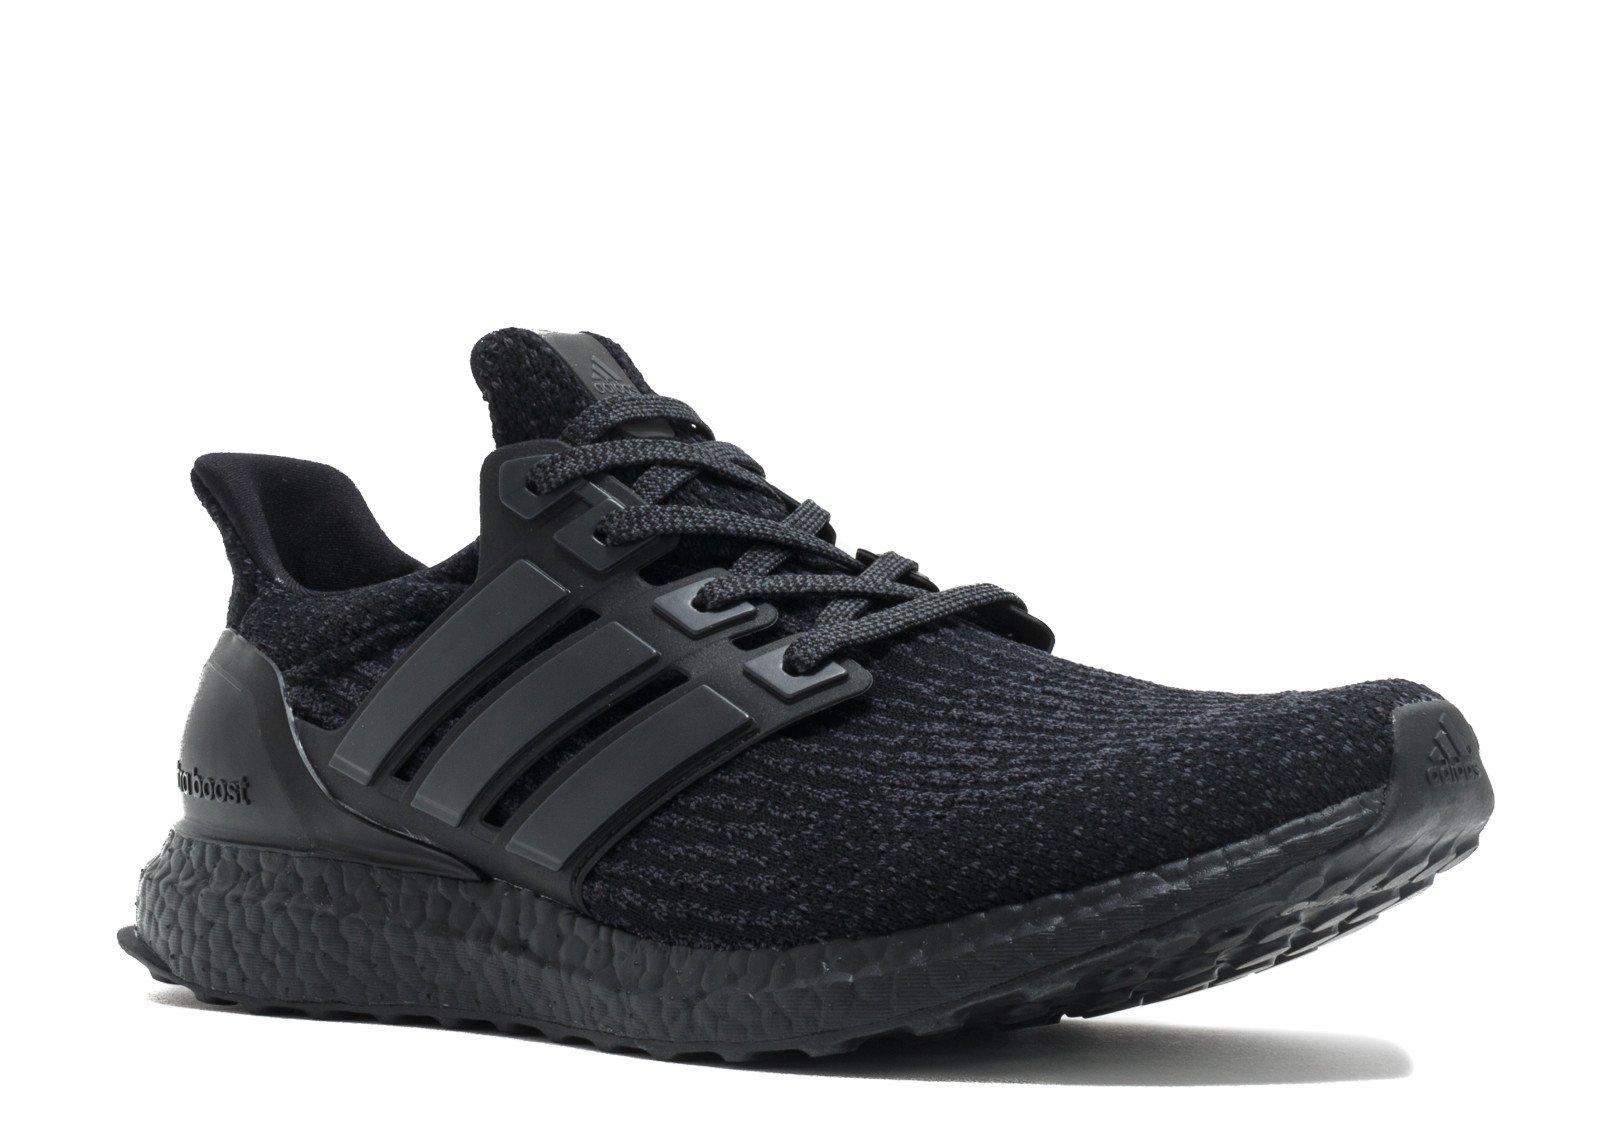 f637ad26cf5 Galleon - Adidas Ultra Boost  Triple Black  - BA8920 - Size 9